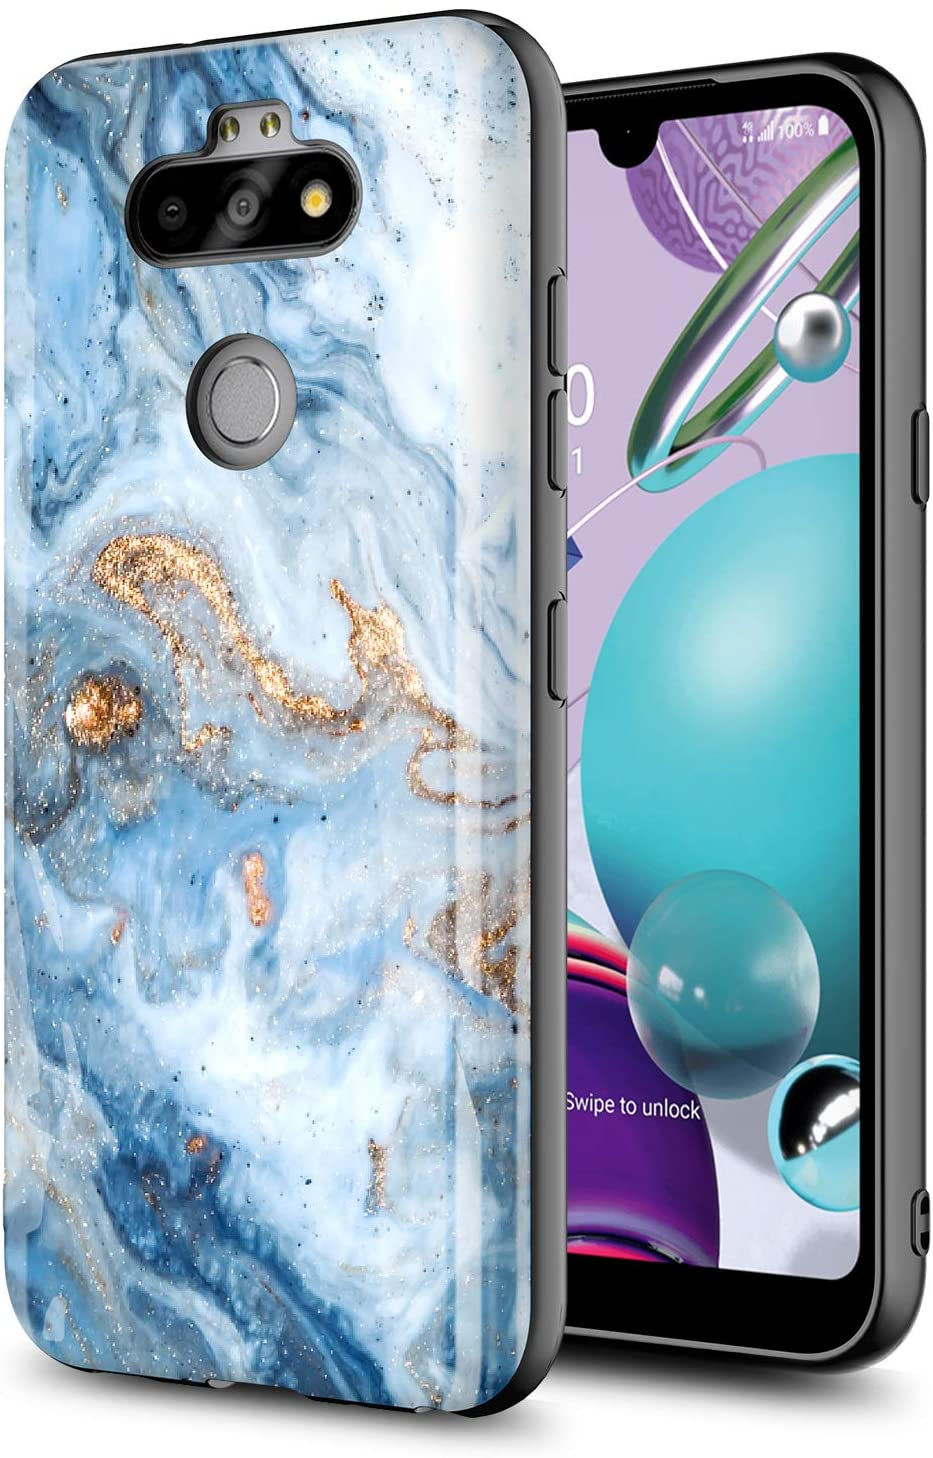 GORGCASE Phone CASE for LG Aristo 5,Aristo 5 Plus,Fortune 3,Phoenix 5,Risio 4,K8X,K31,LG Tribute Monarch, Slim Anti-Scratch Hybrid PC TPU Armor Cute Man Girls Women Drop Protective Cover Blue Marble